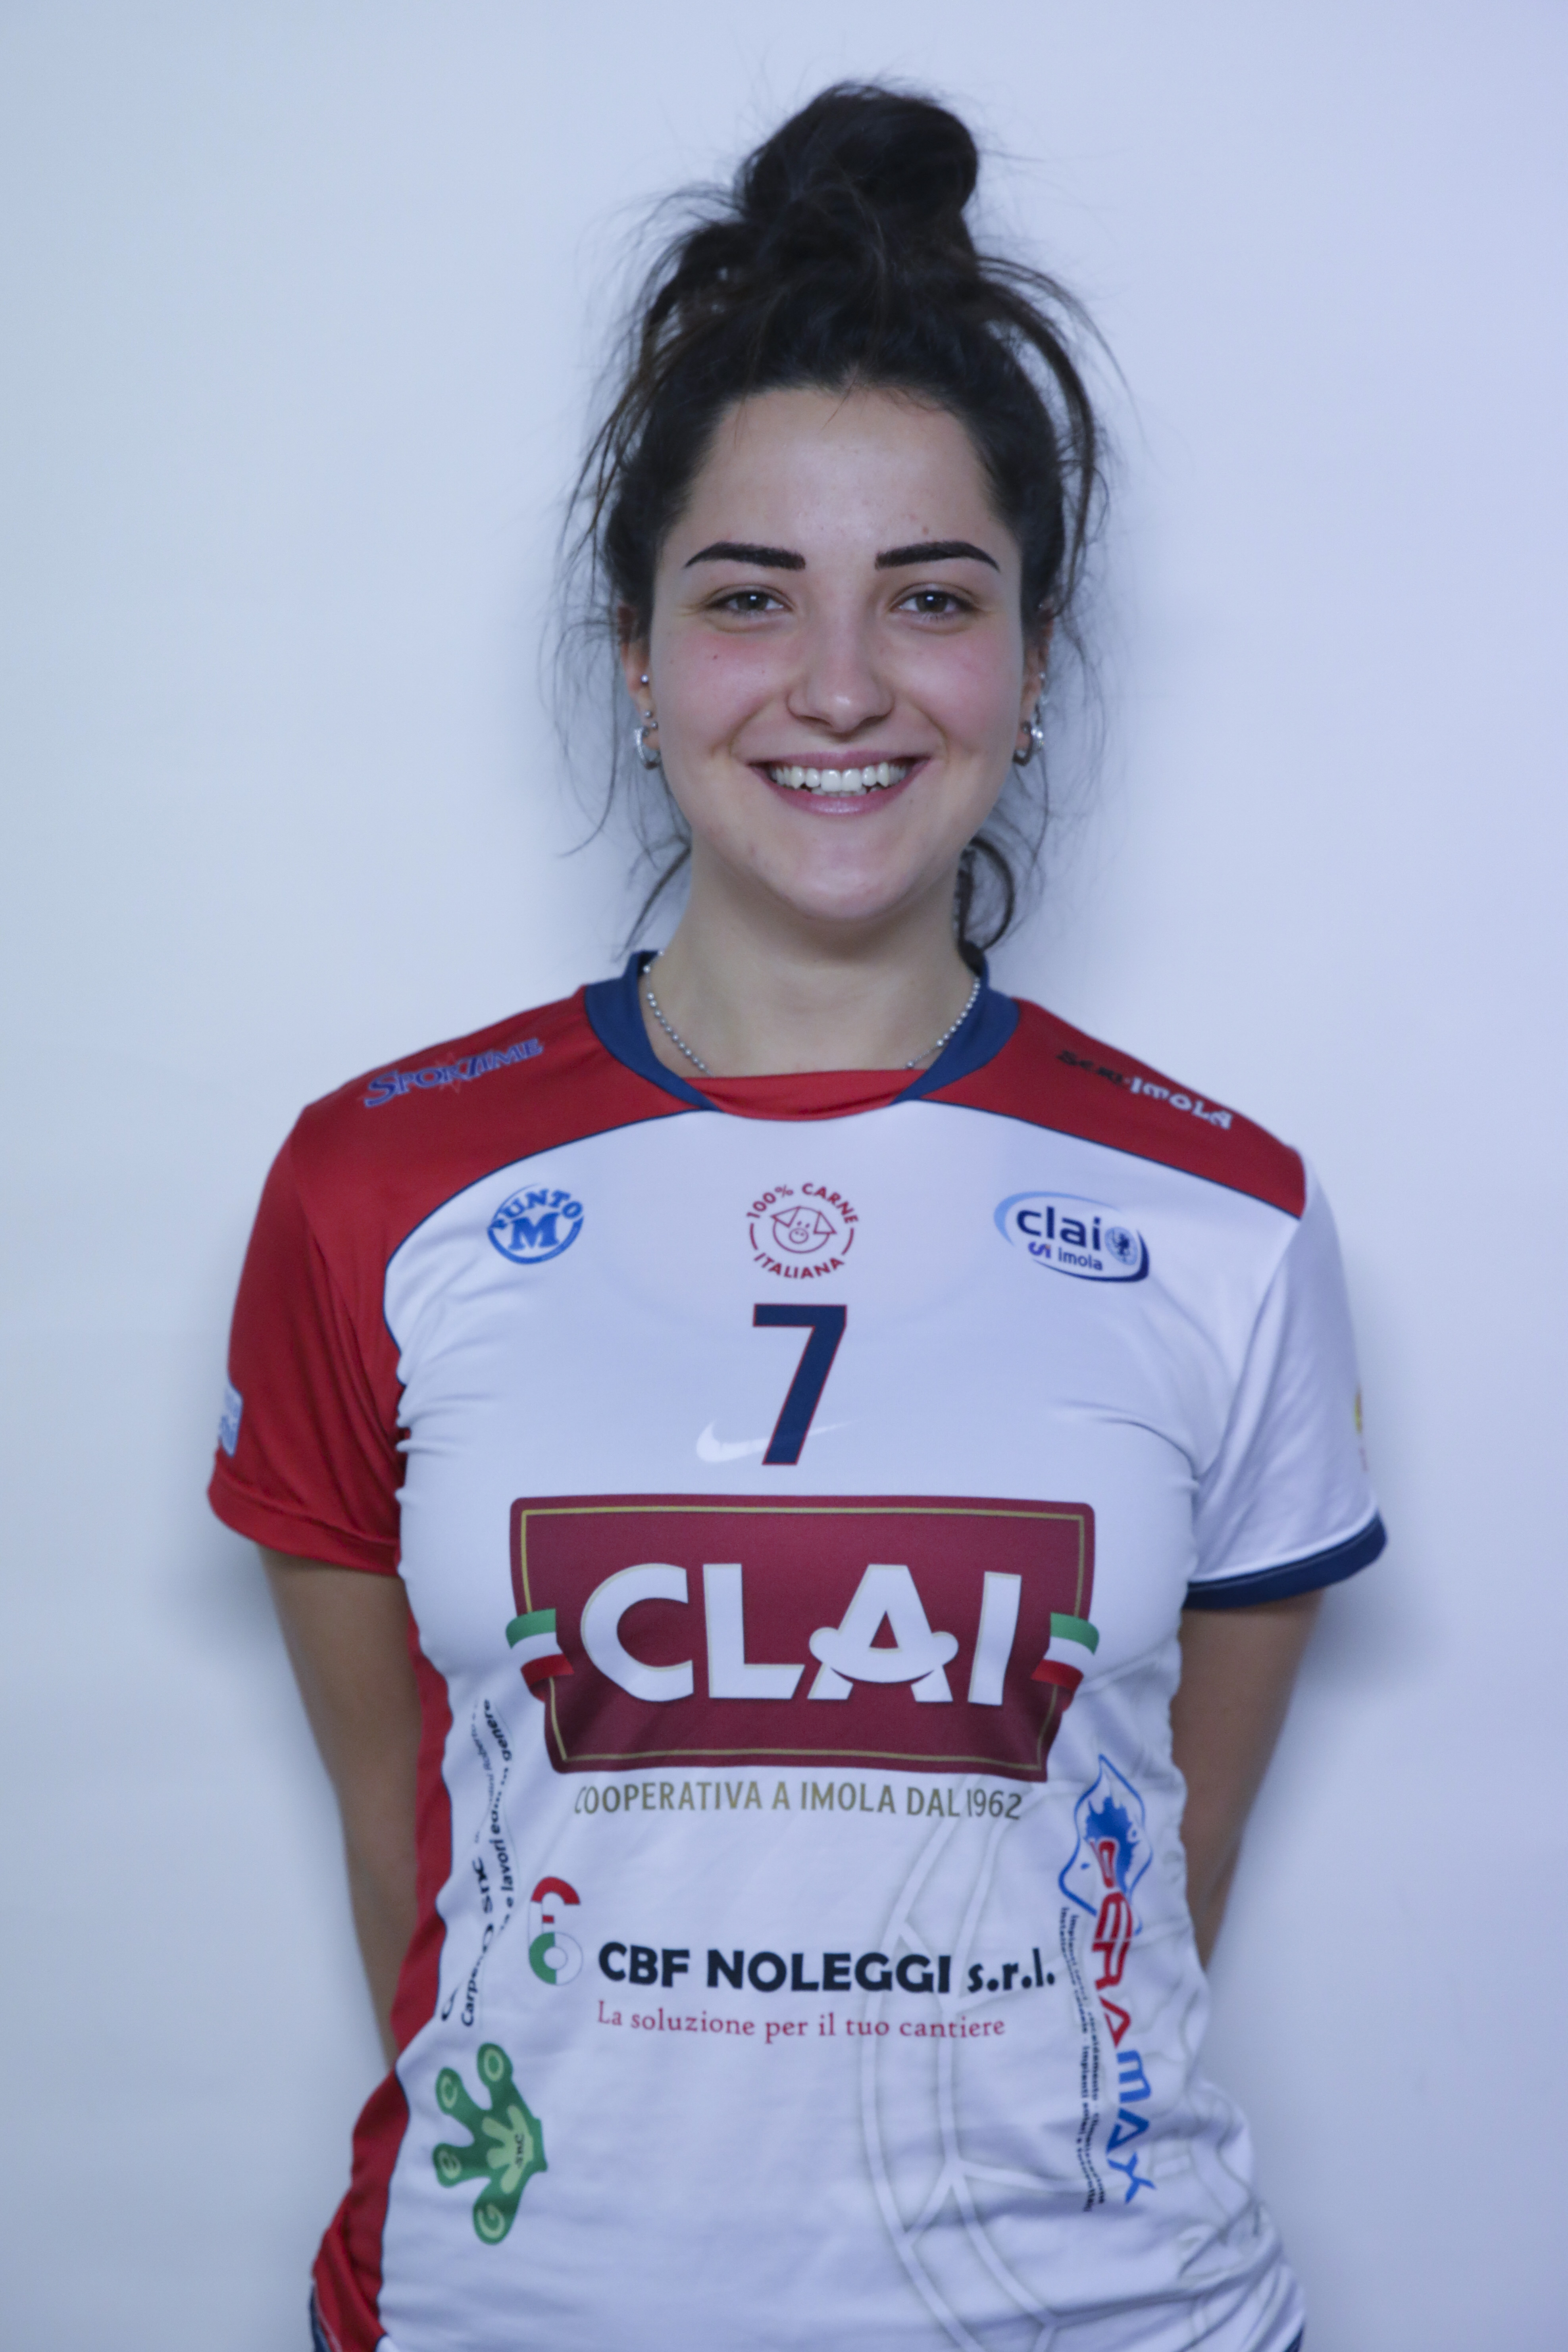 Ilaria Bughignoli